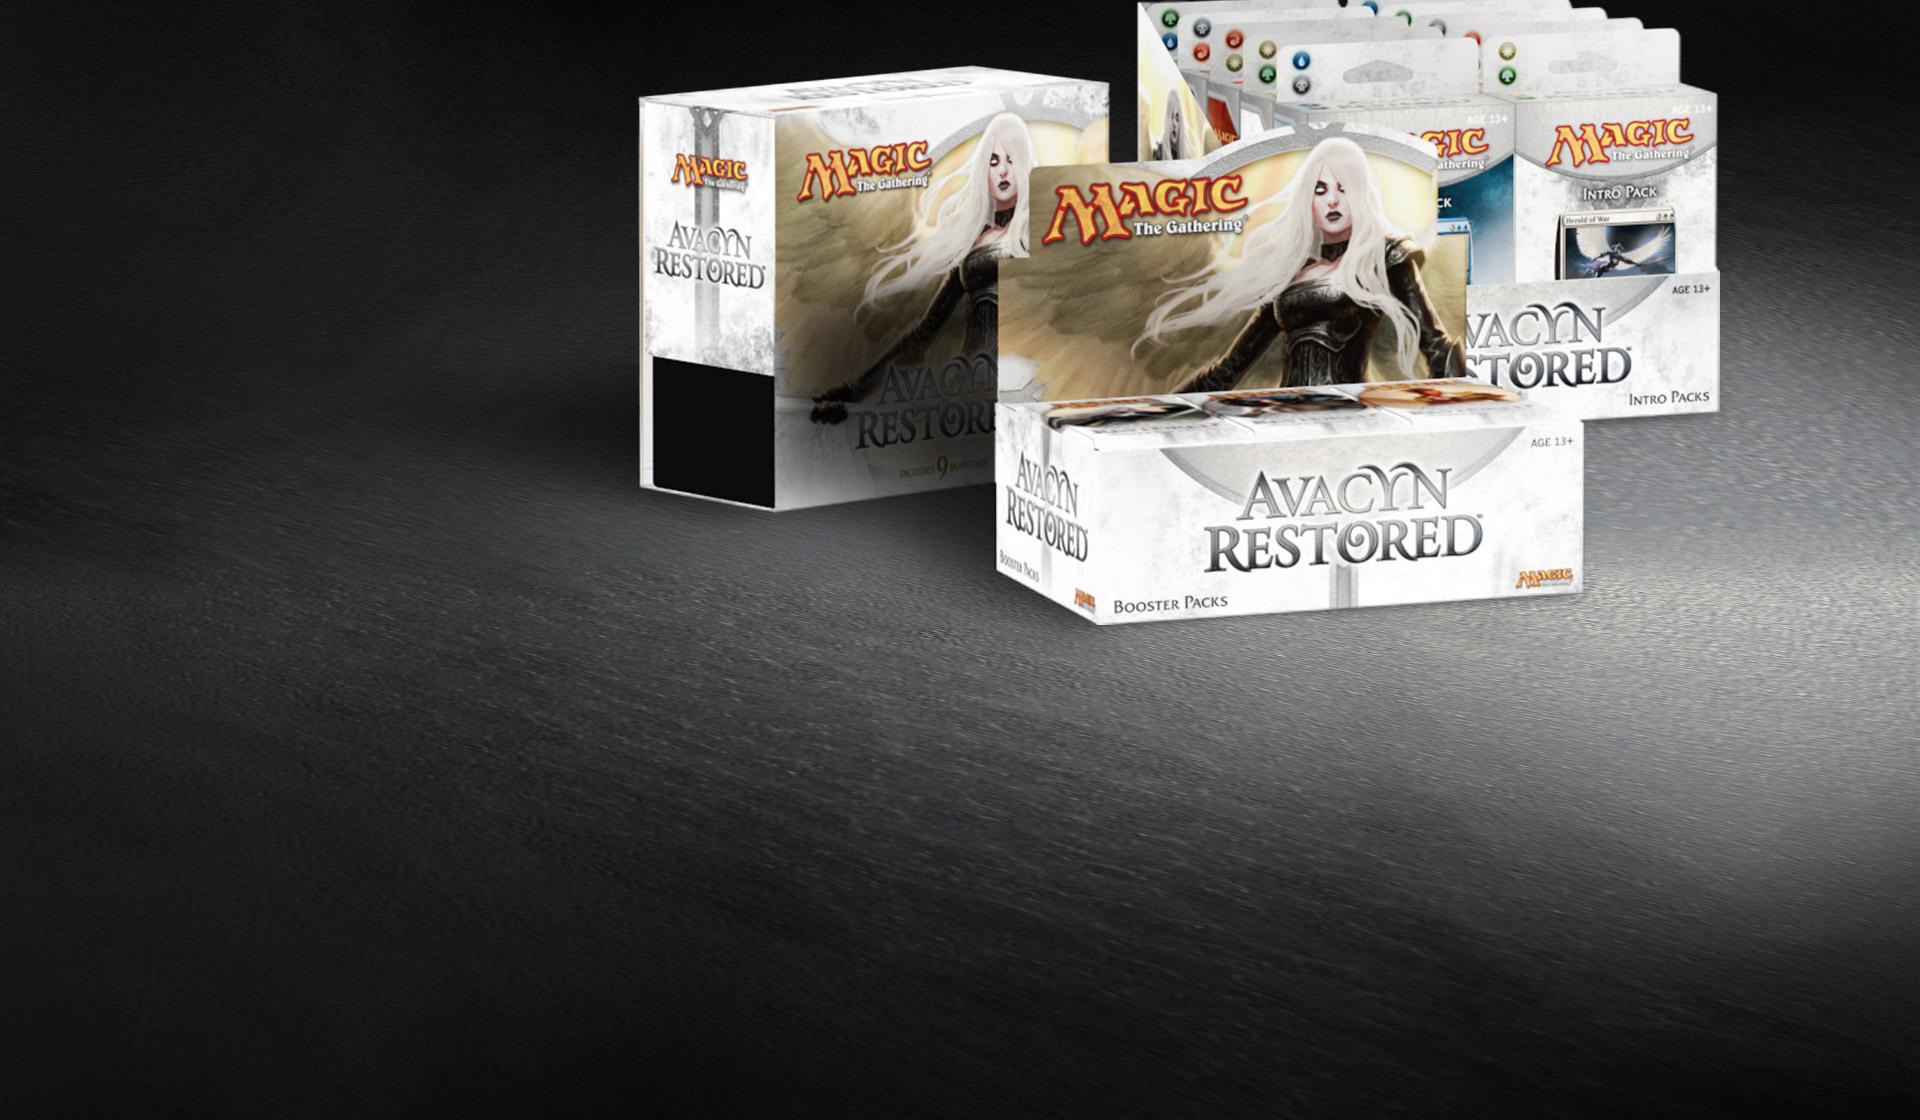 1x Battle HymnFOILAvacyn RestoredMTG Magic Cards